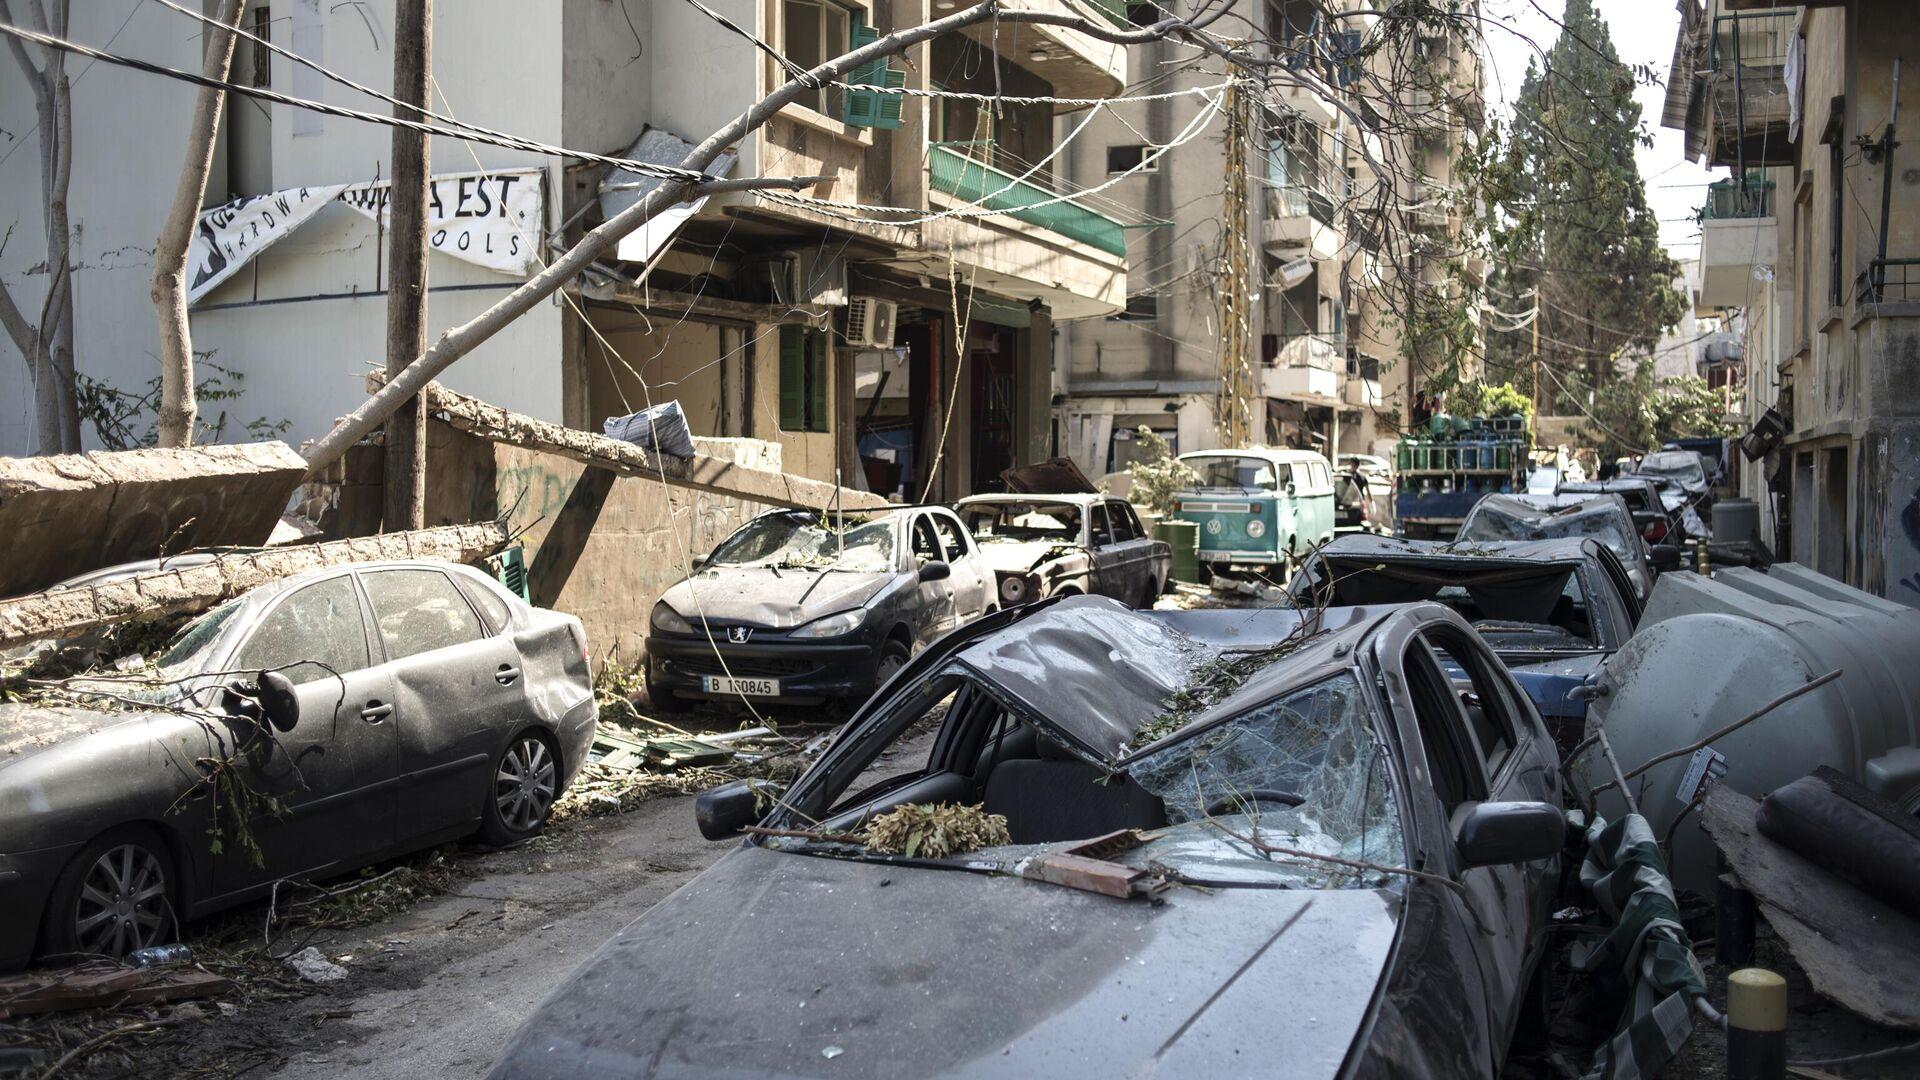 Последствия взрыва в Ливане  - РИА Новости, 1920, 04.09.2020